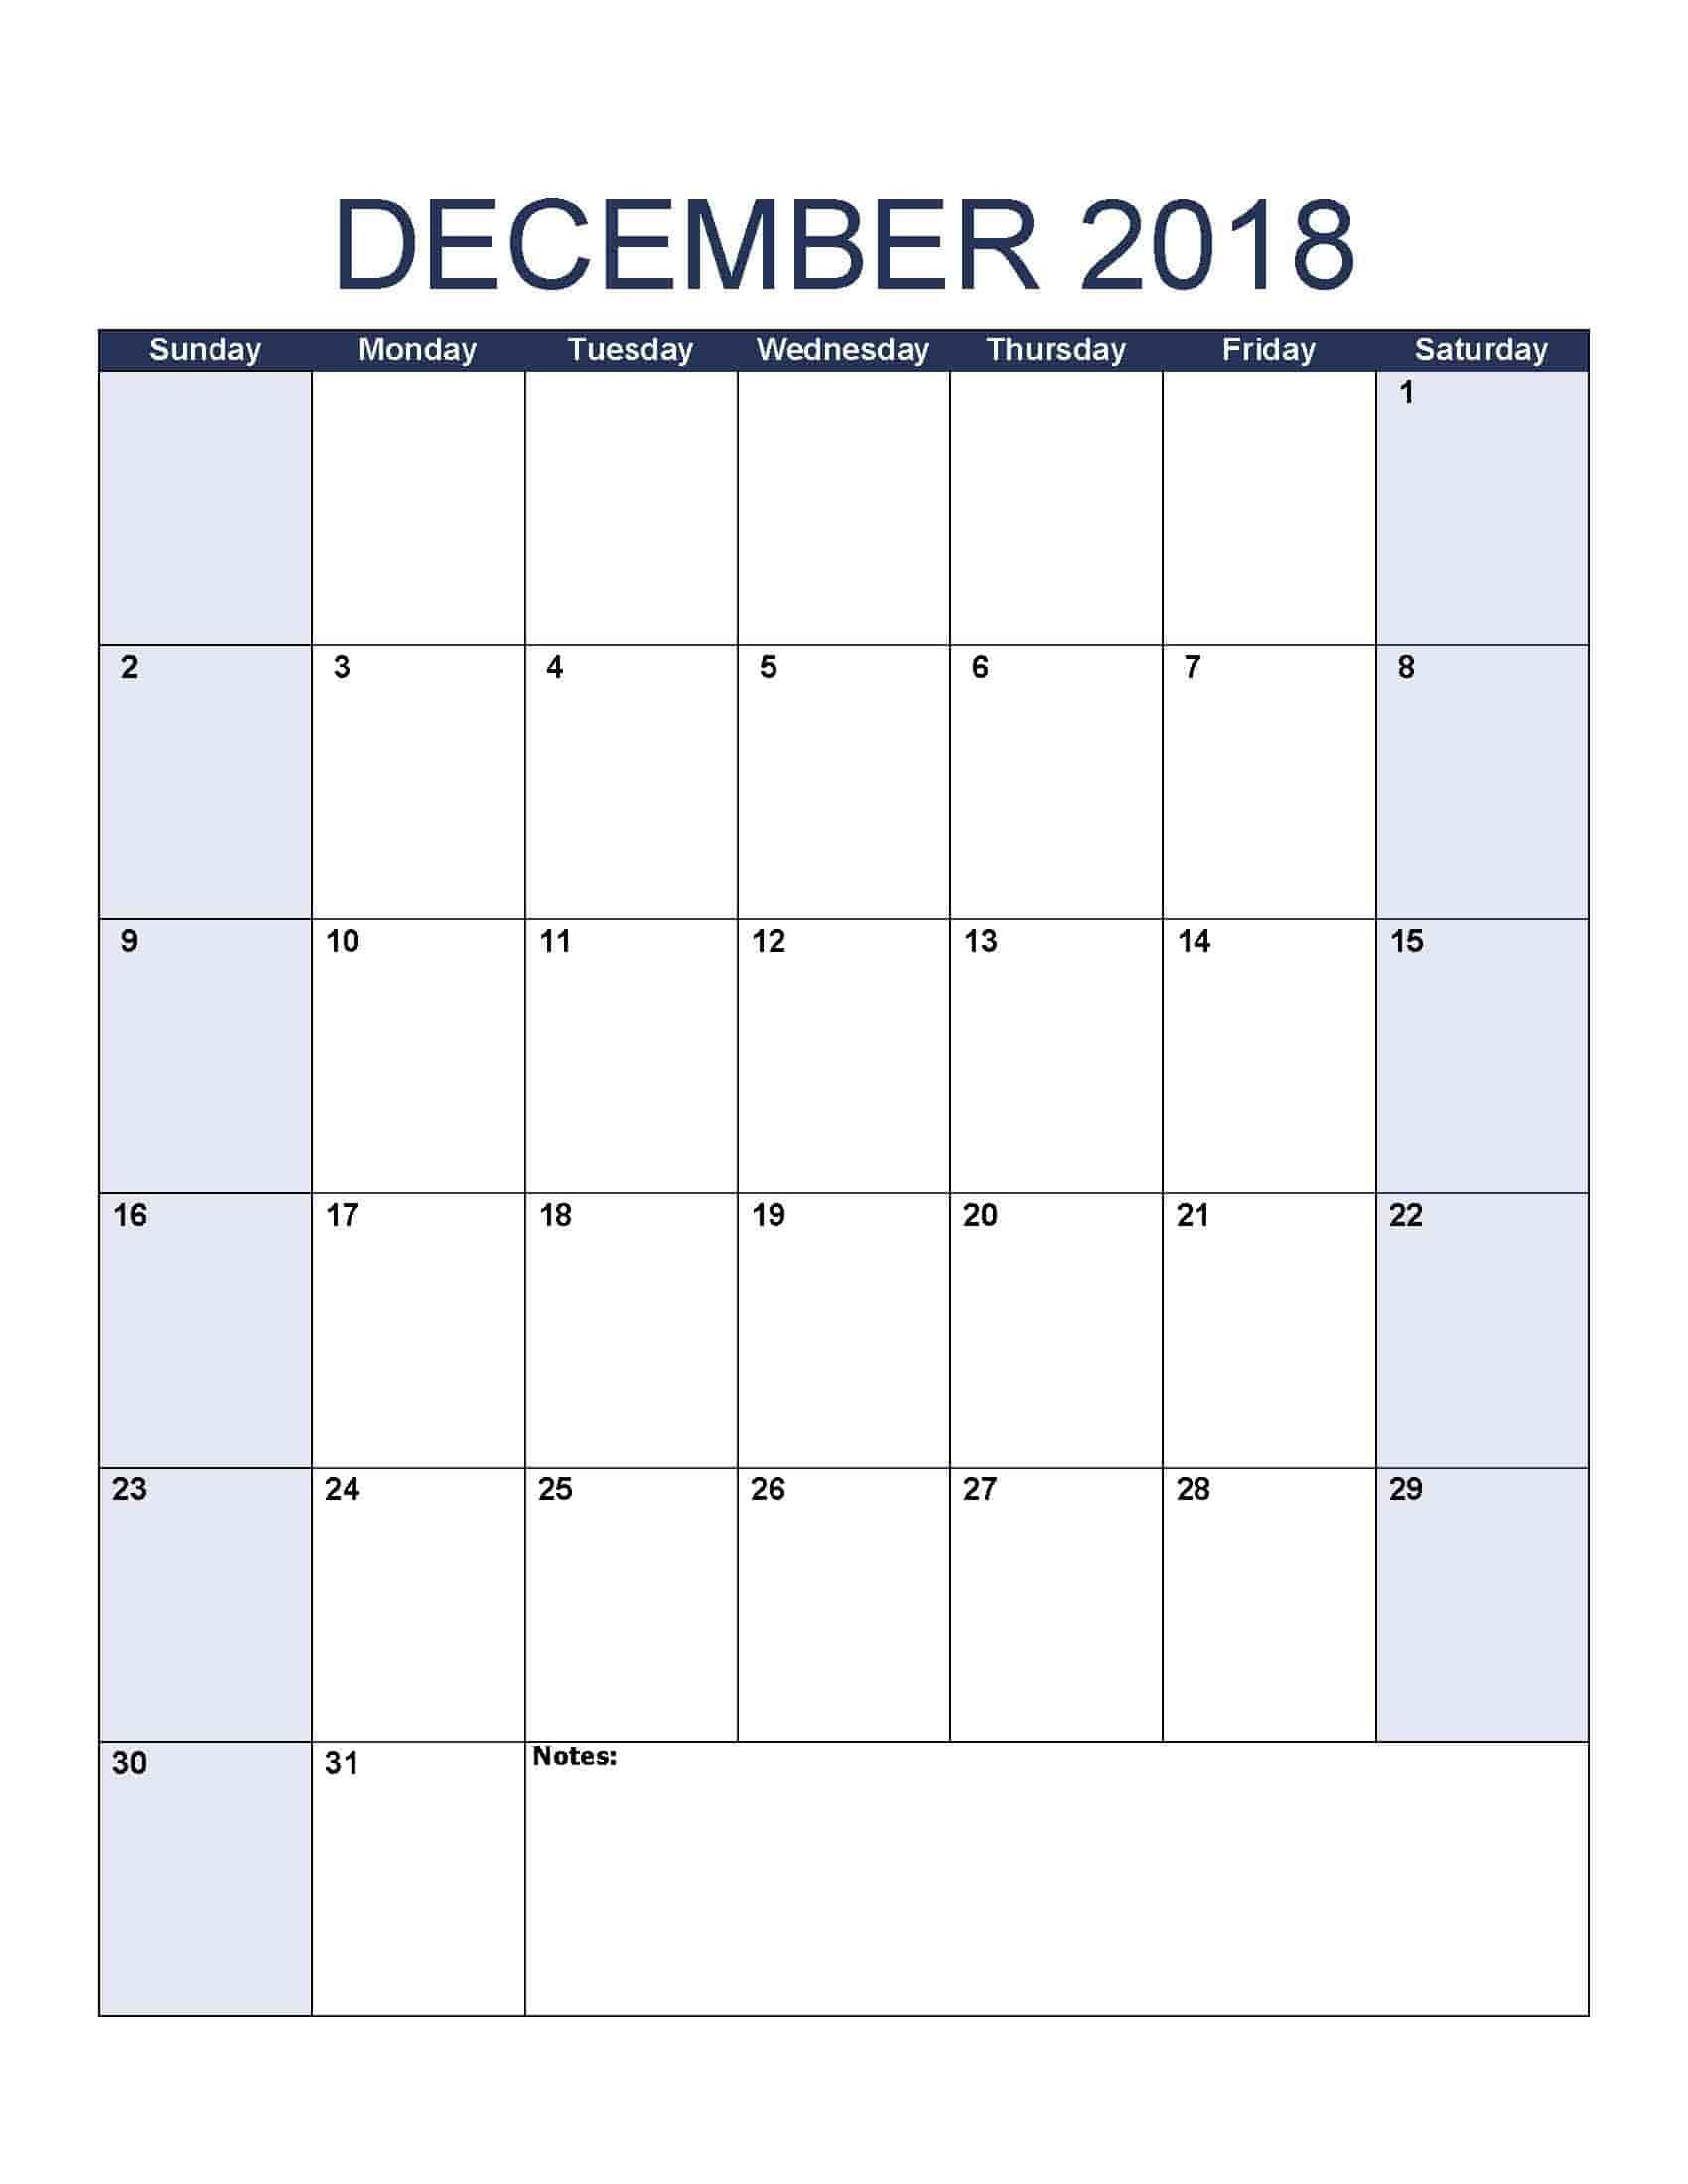 December 2018 Calendar - Free, Printable Calendar Templates